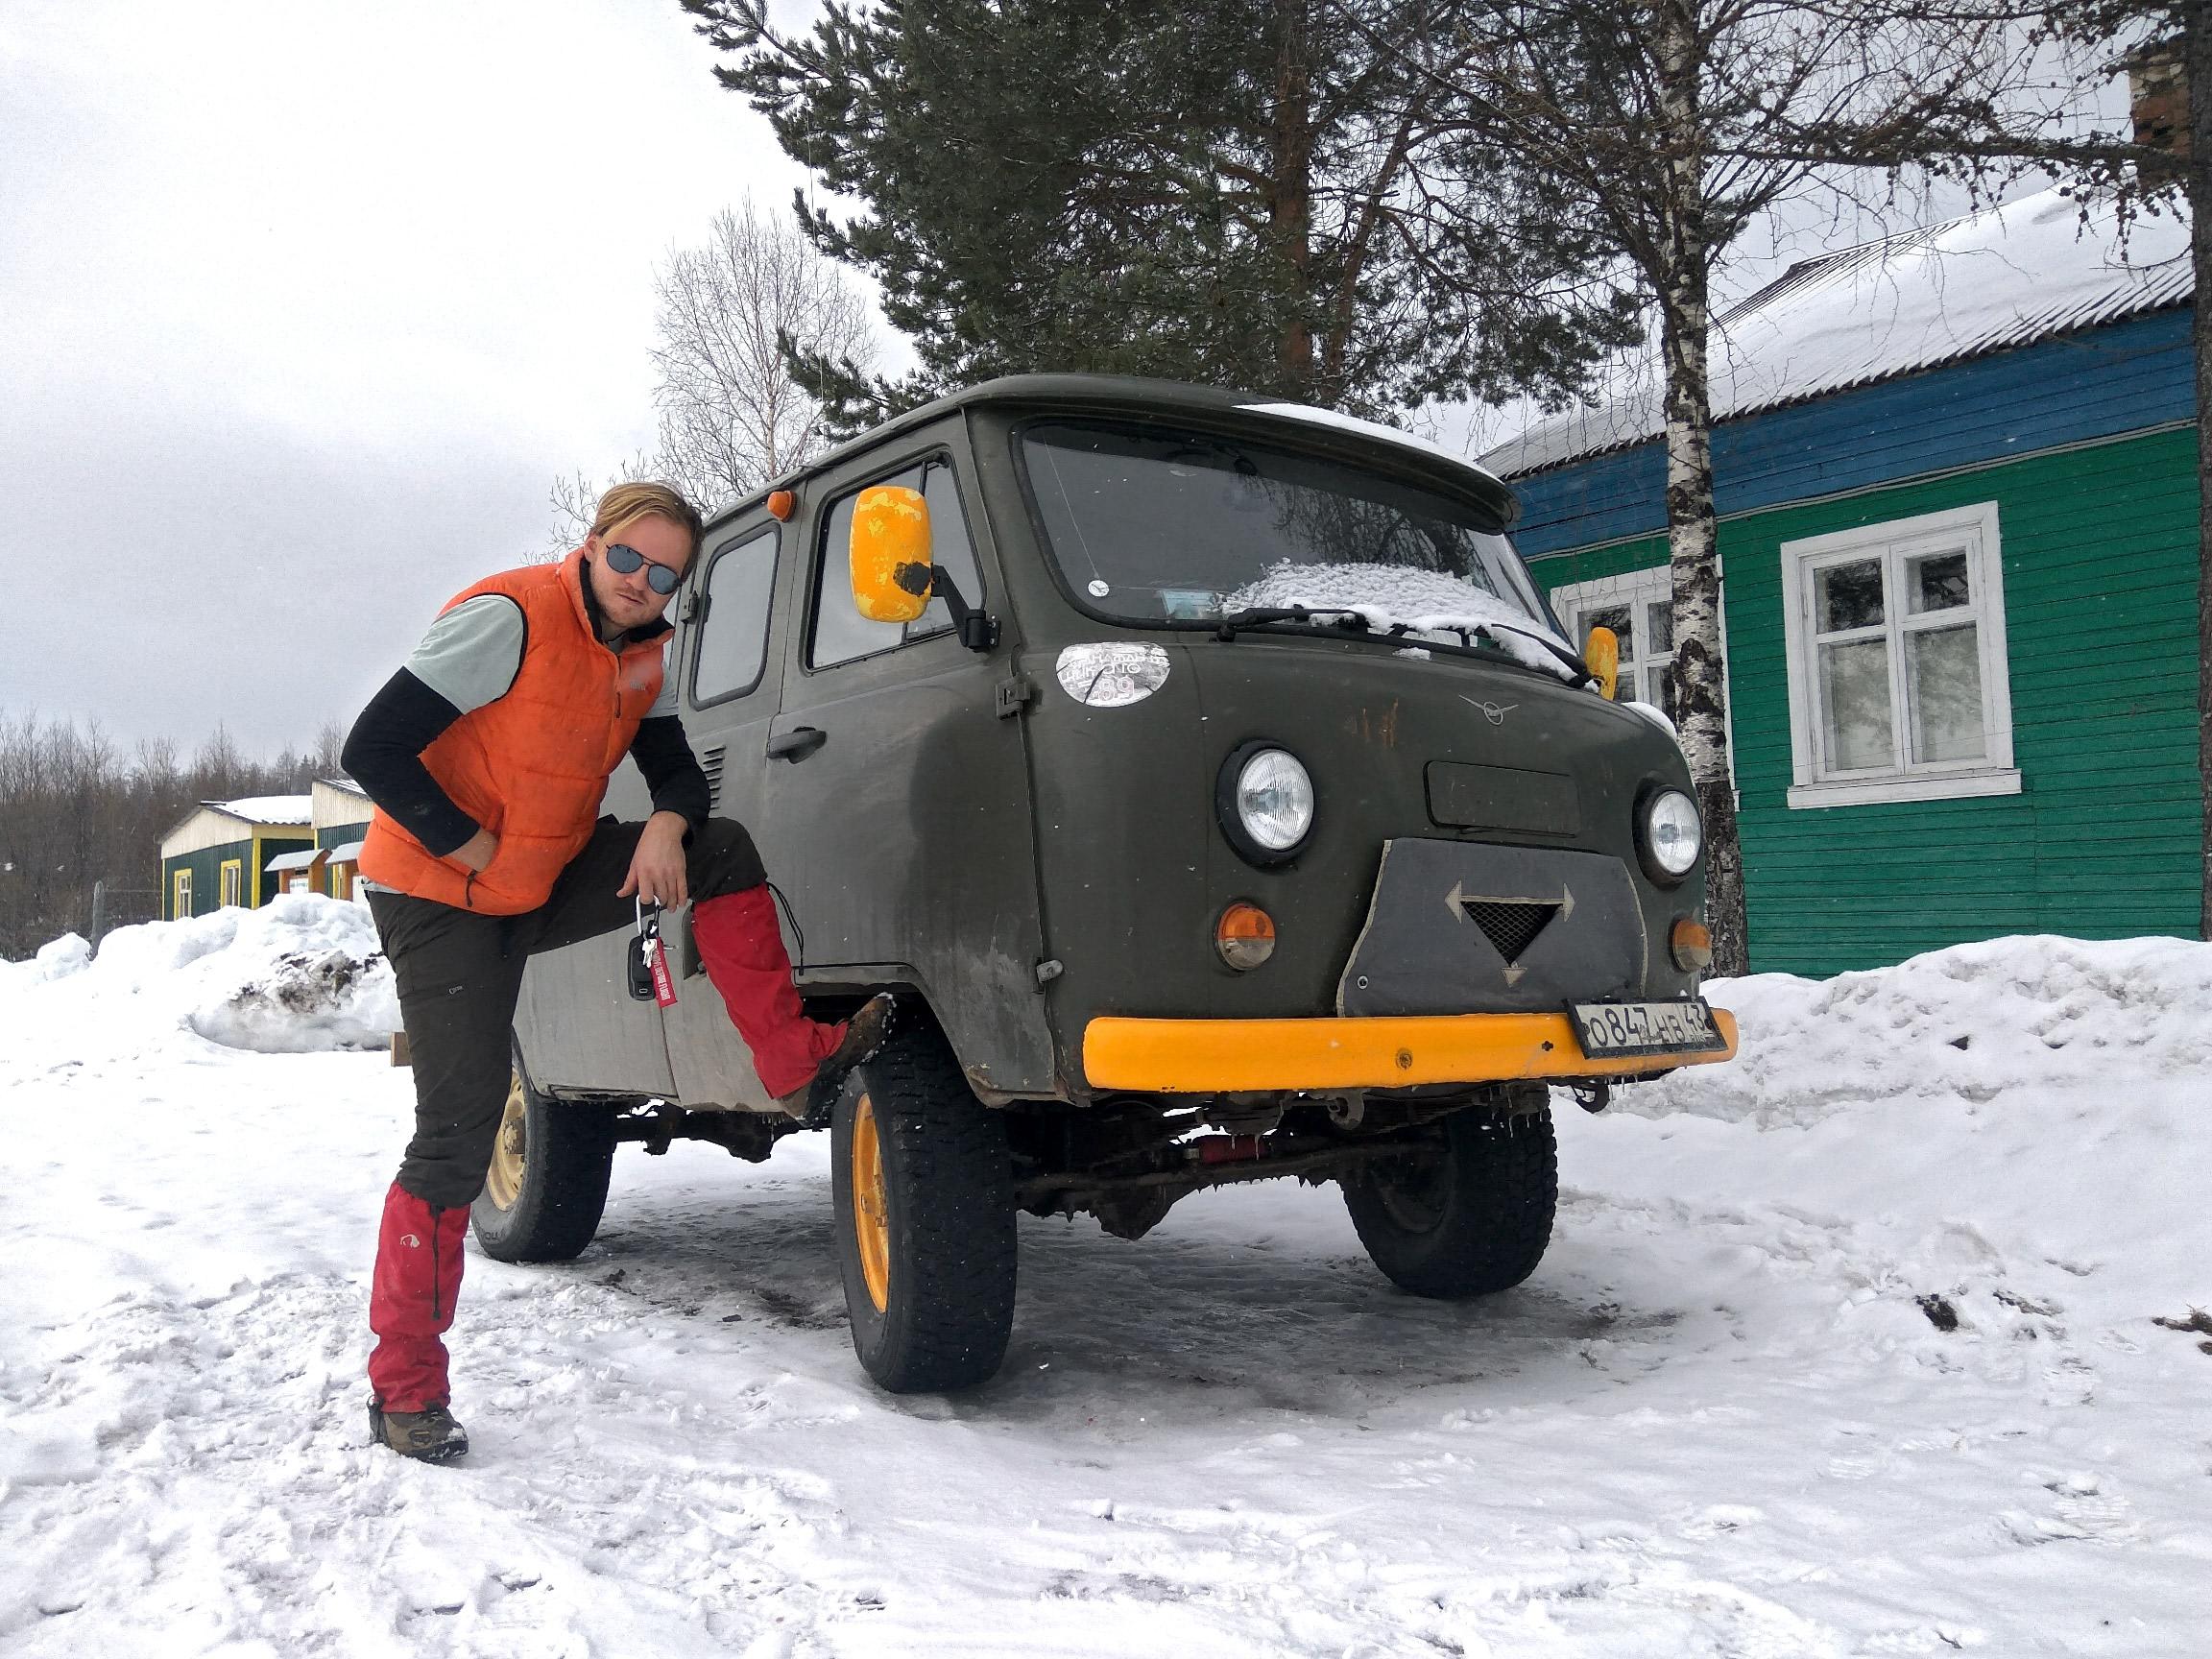 A Tourist With The Military Van-Buhanka